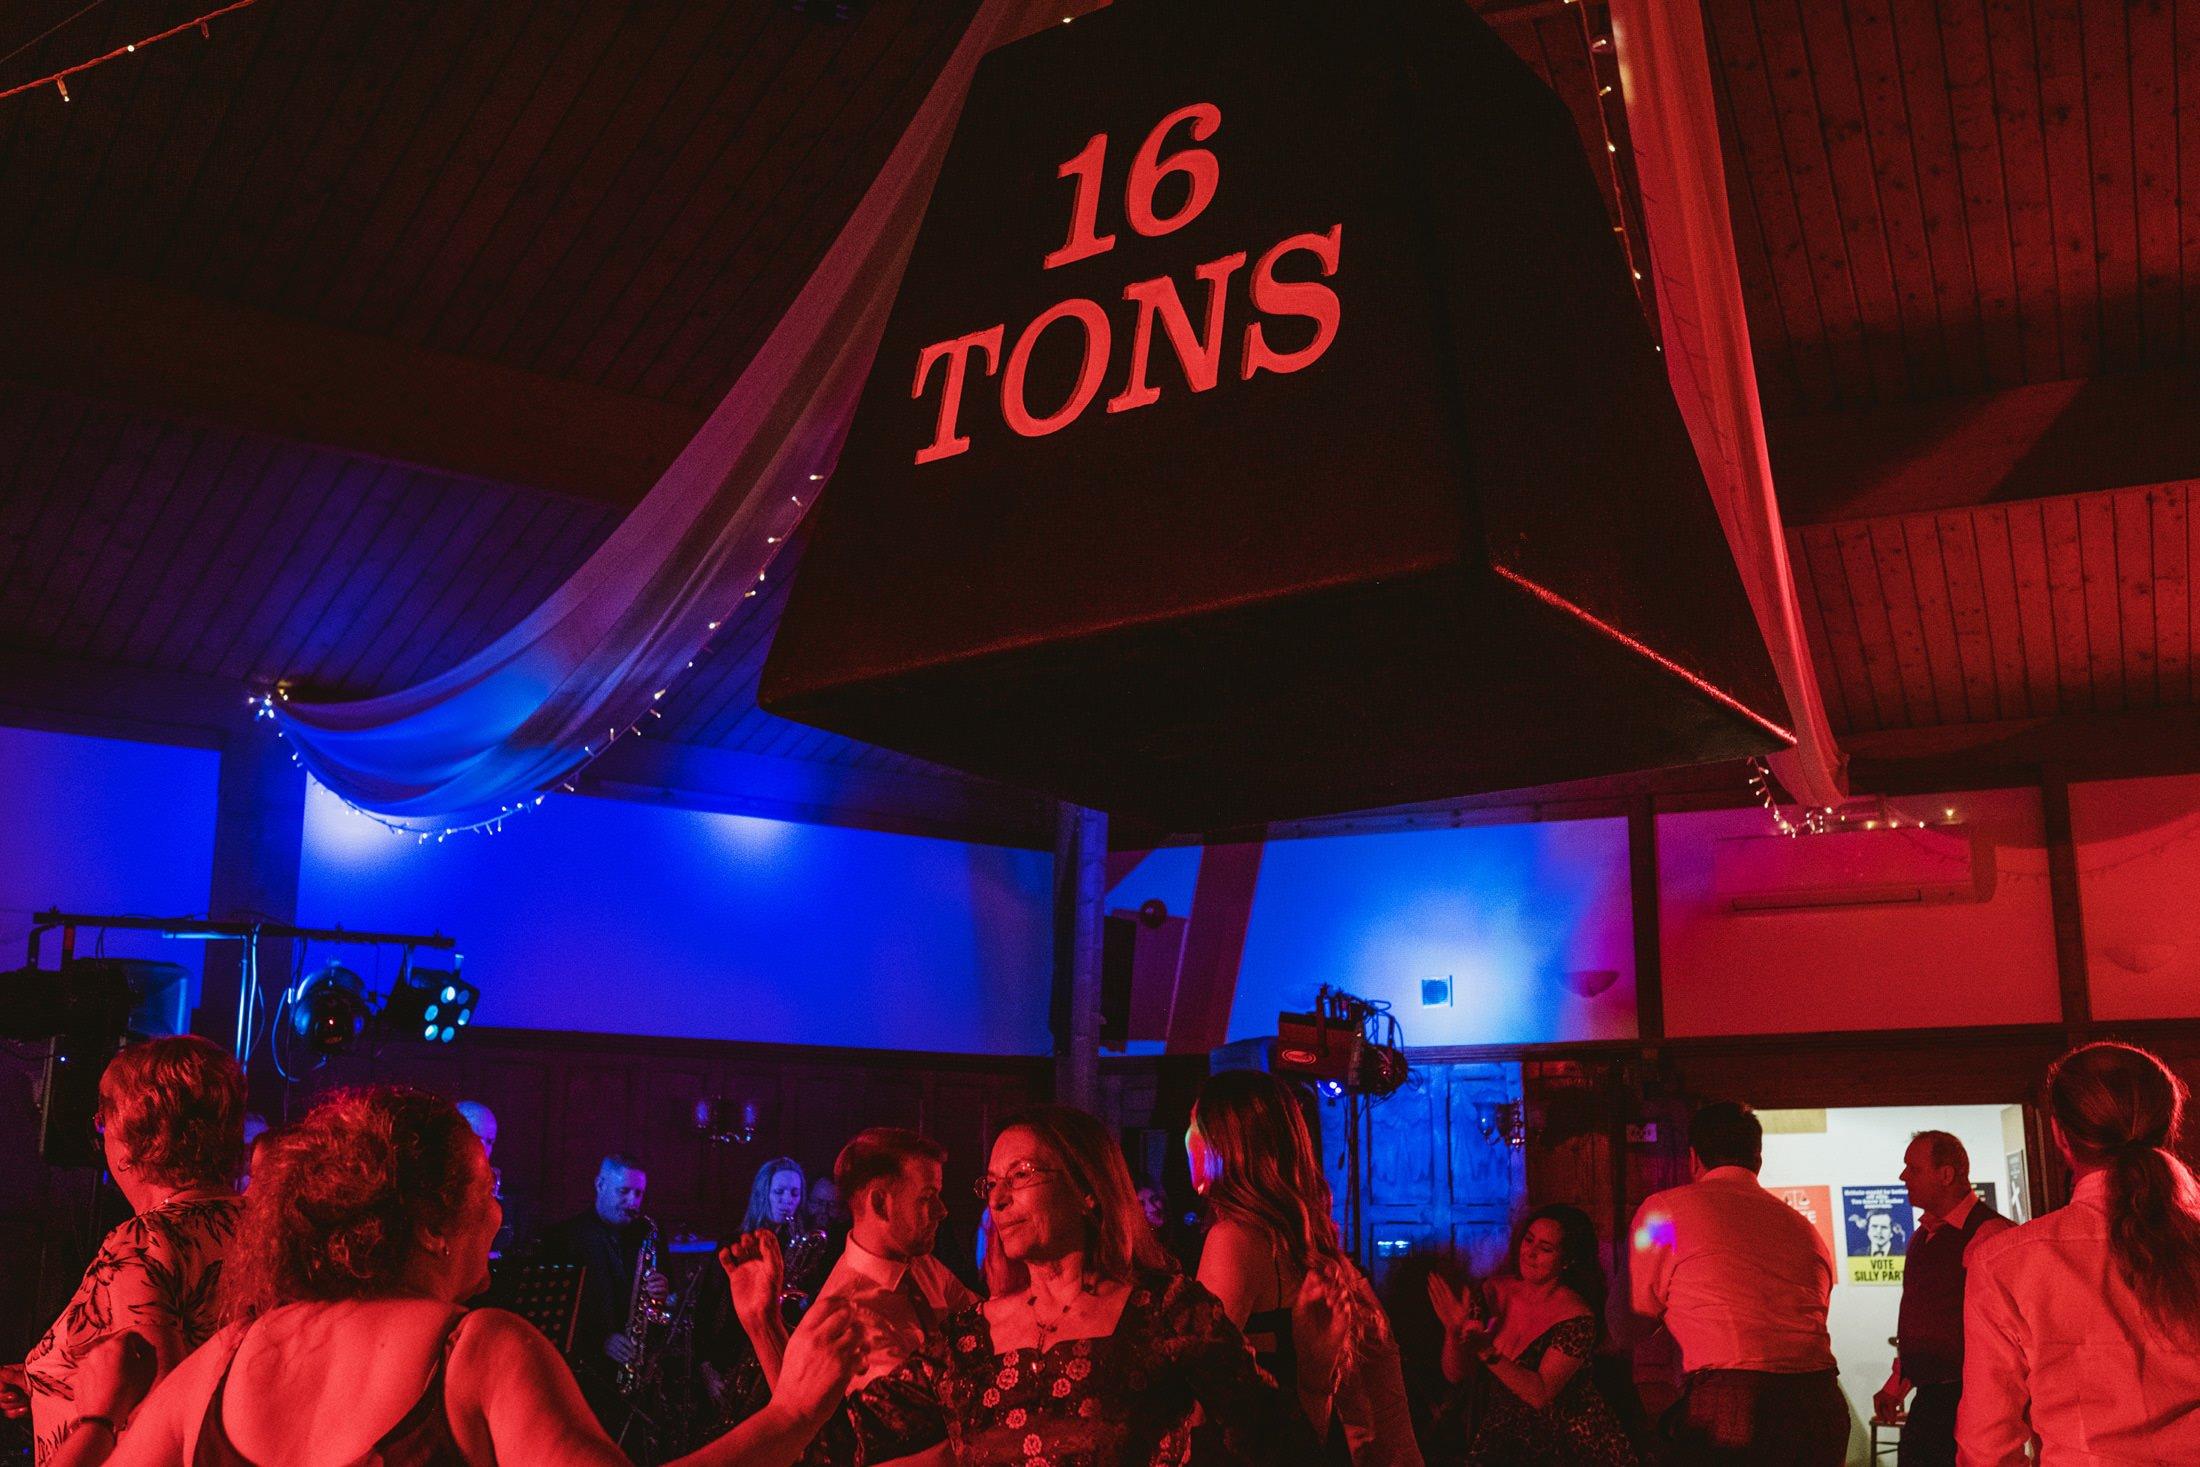 16 ton weight on the dance floor